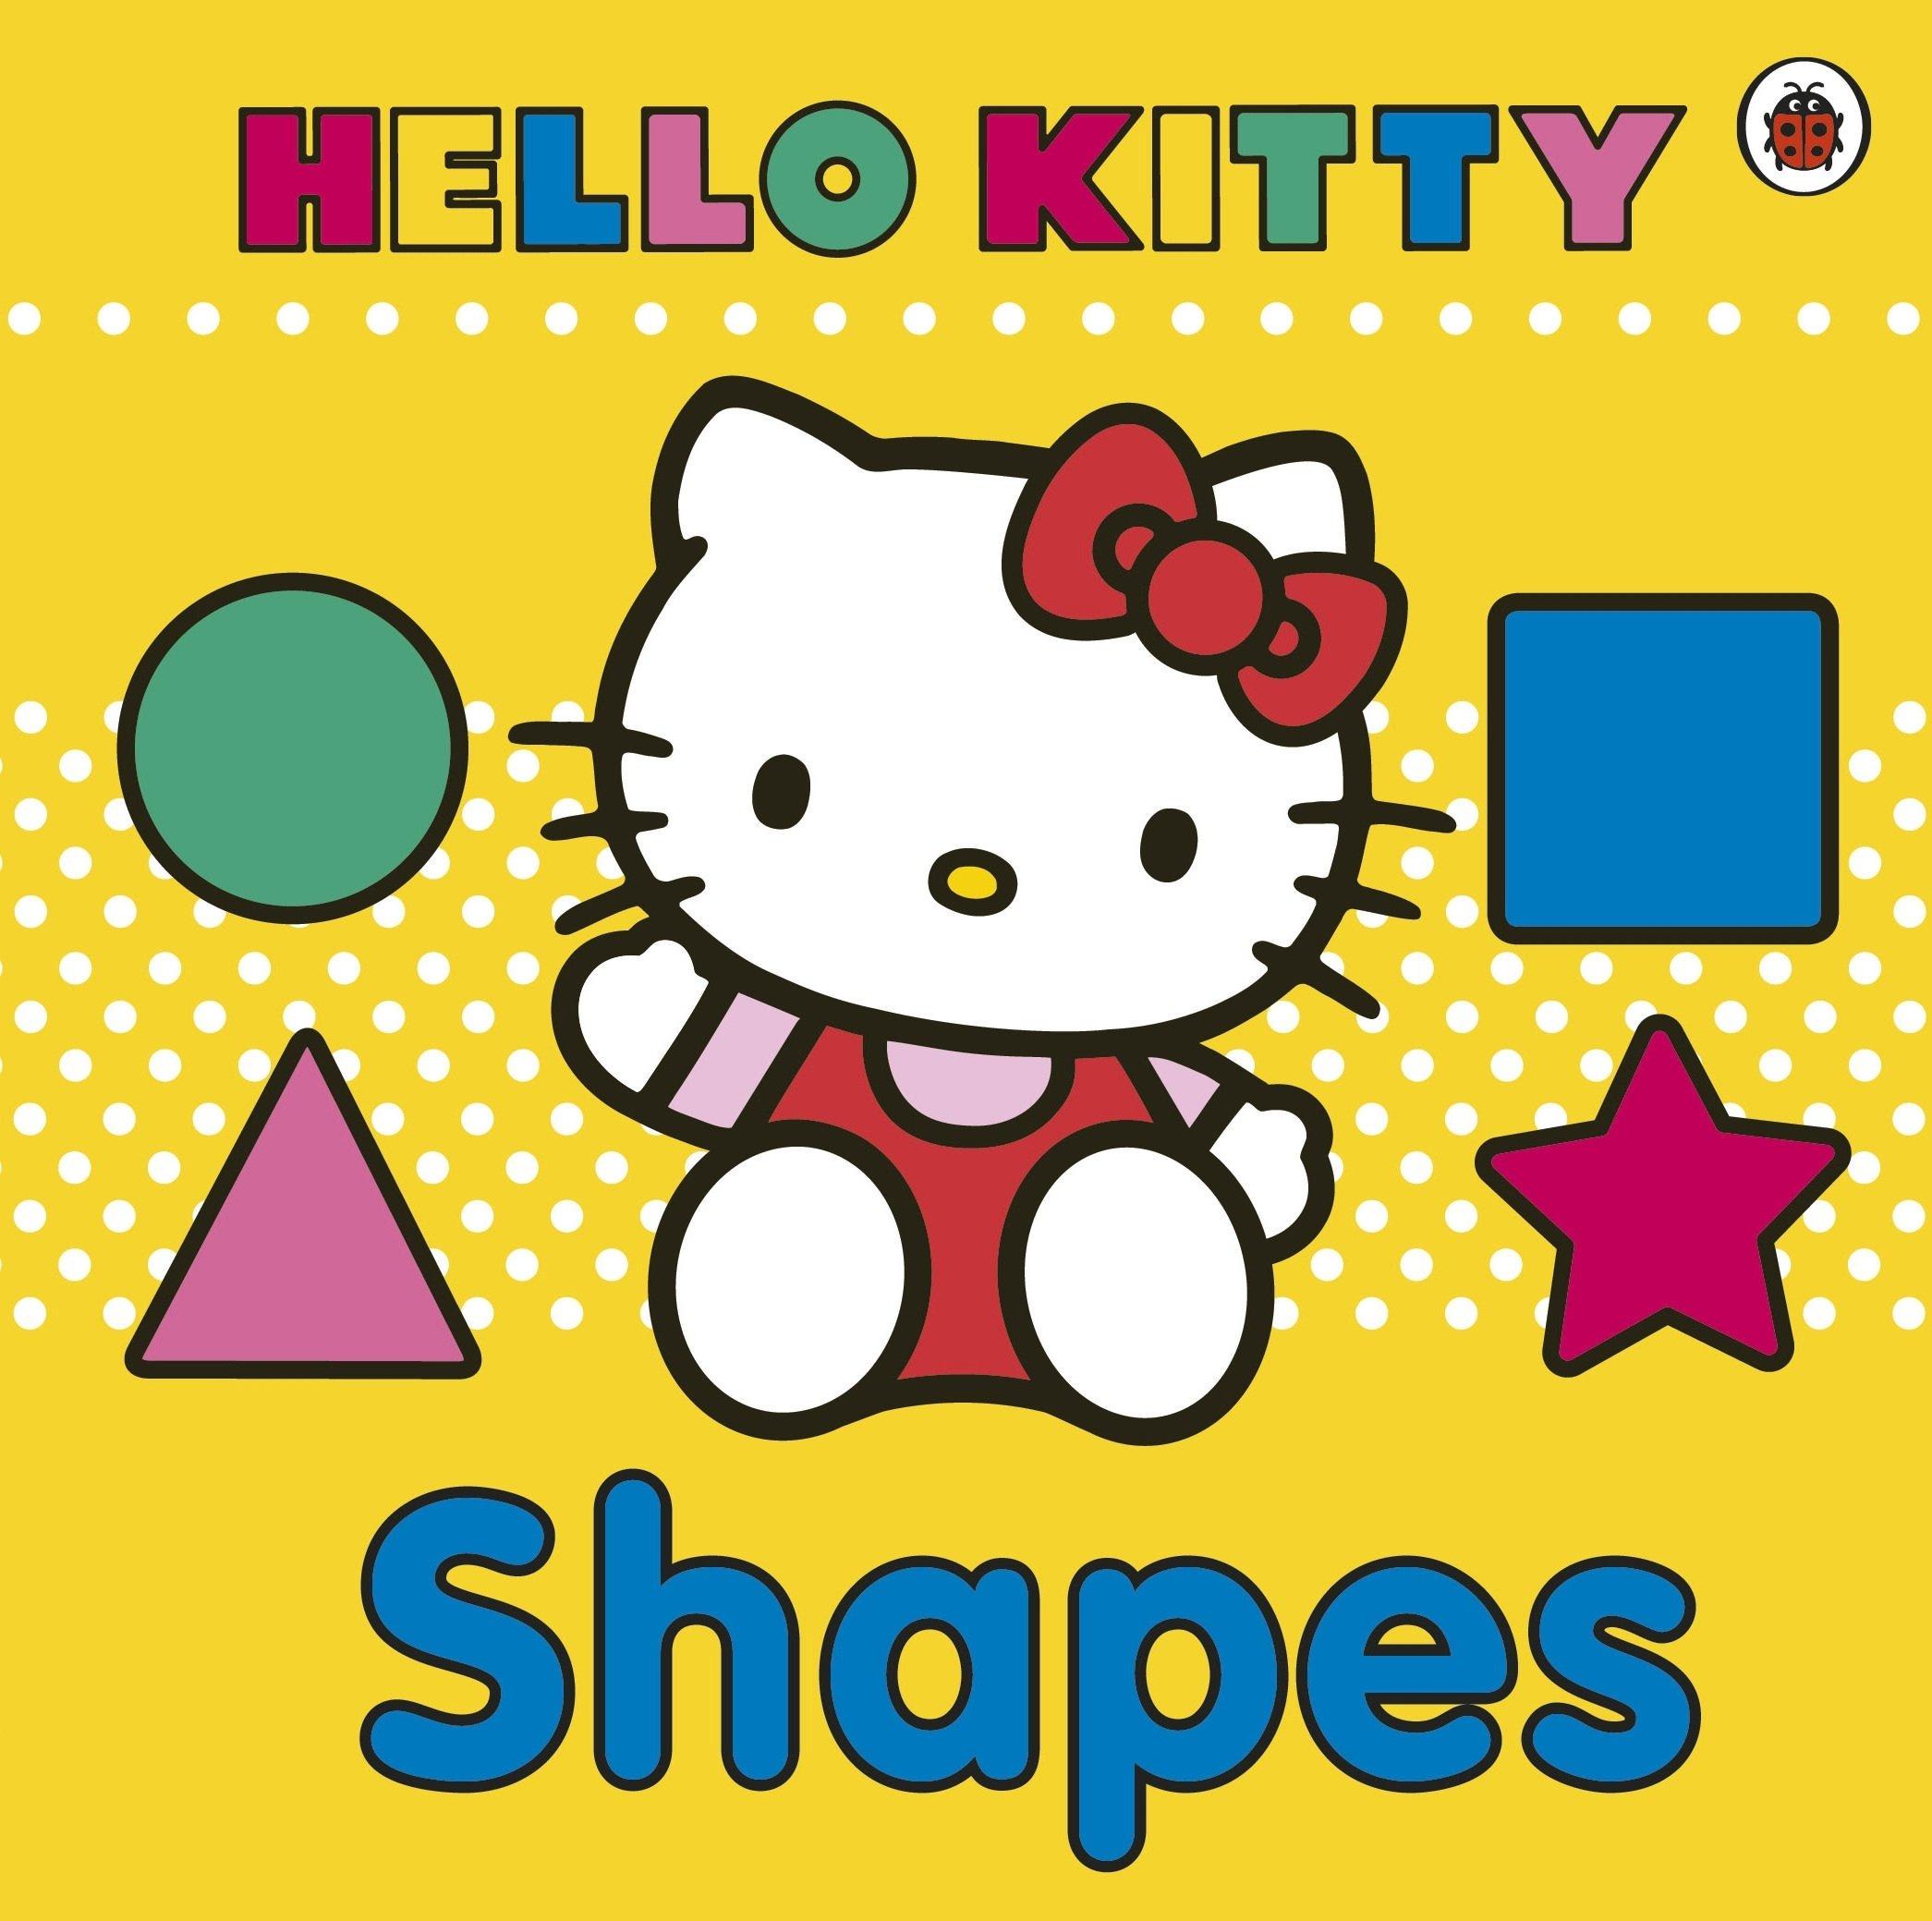 6cc9ad16e Hello Kitty: Shapes Board Book: Amazon.co.uk: 9781409312178: Books